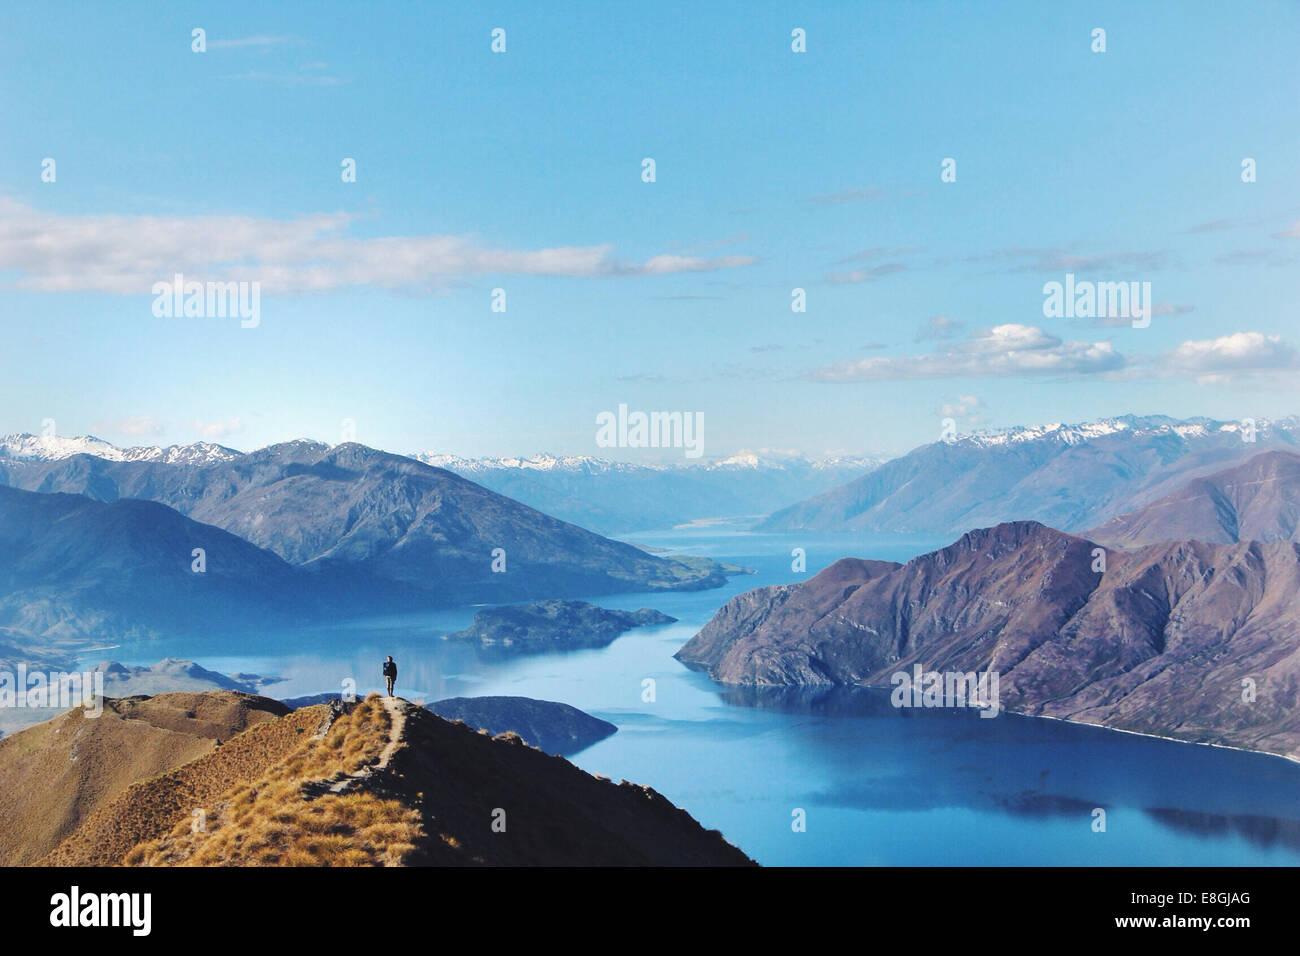 Frau stehend auf Berg, Canterbury, Neuseeland Stockbild